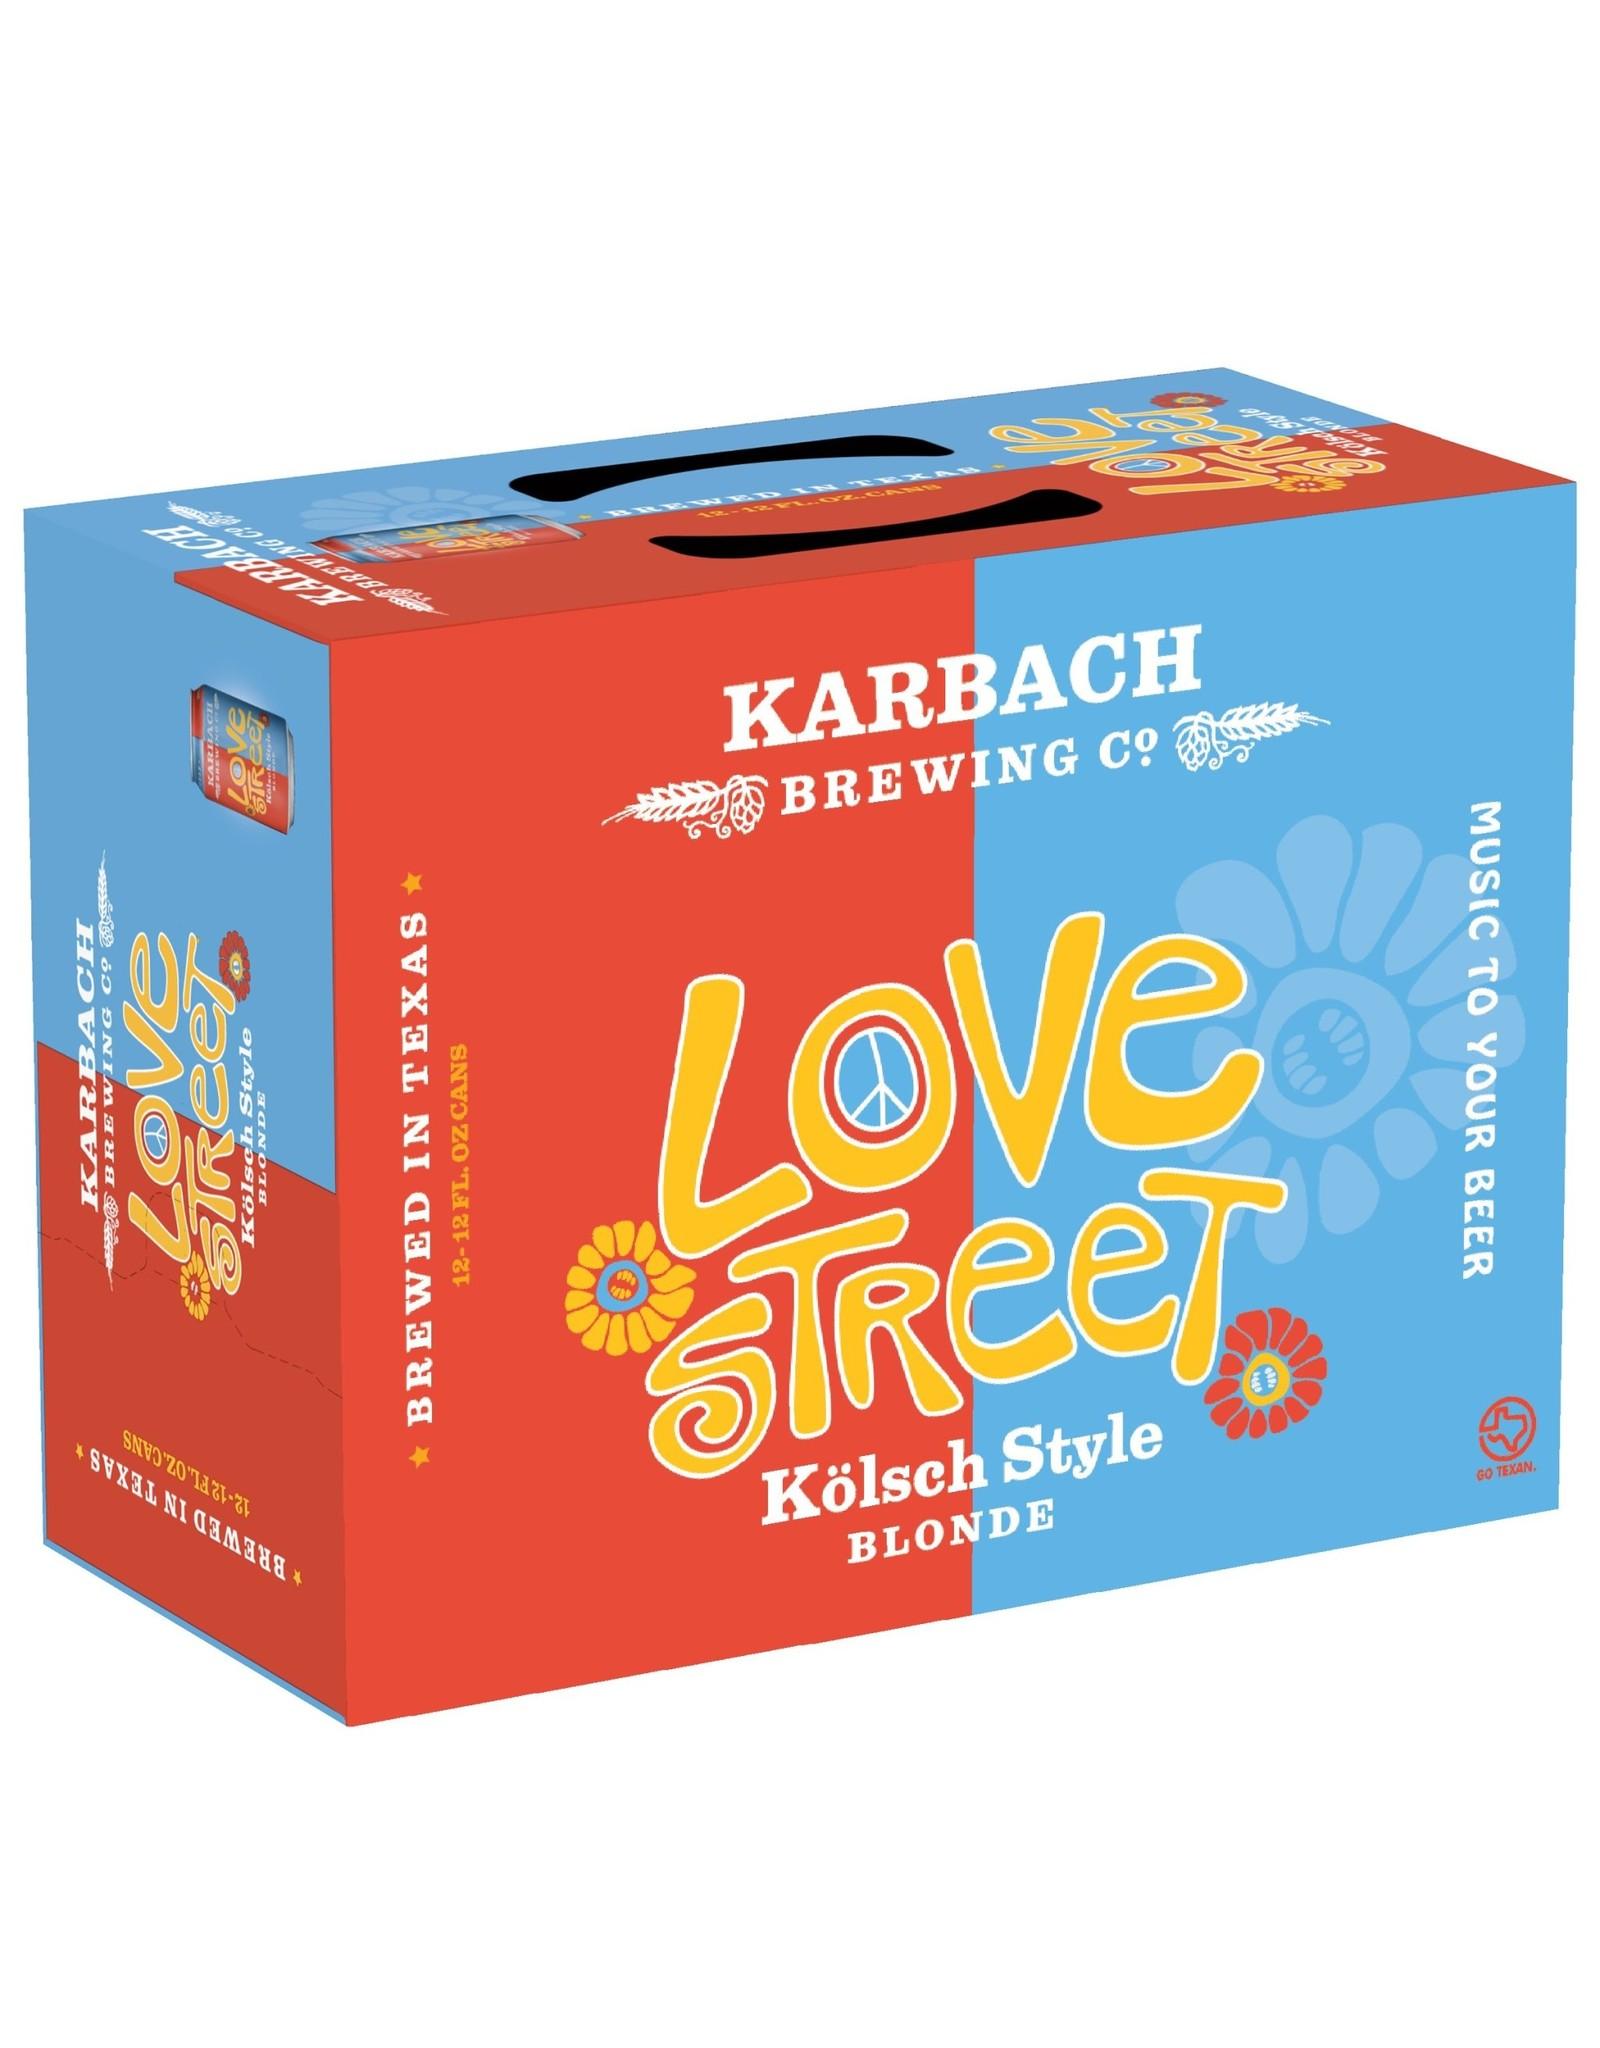 KARBACH LOVE STREET 12-12 CAN